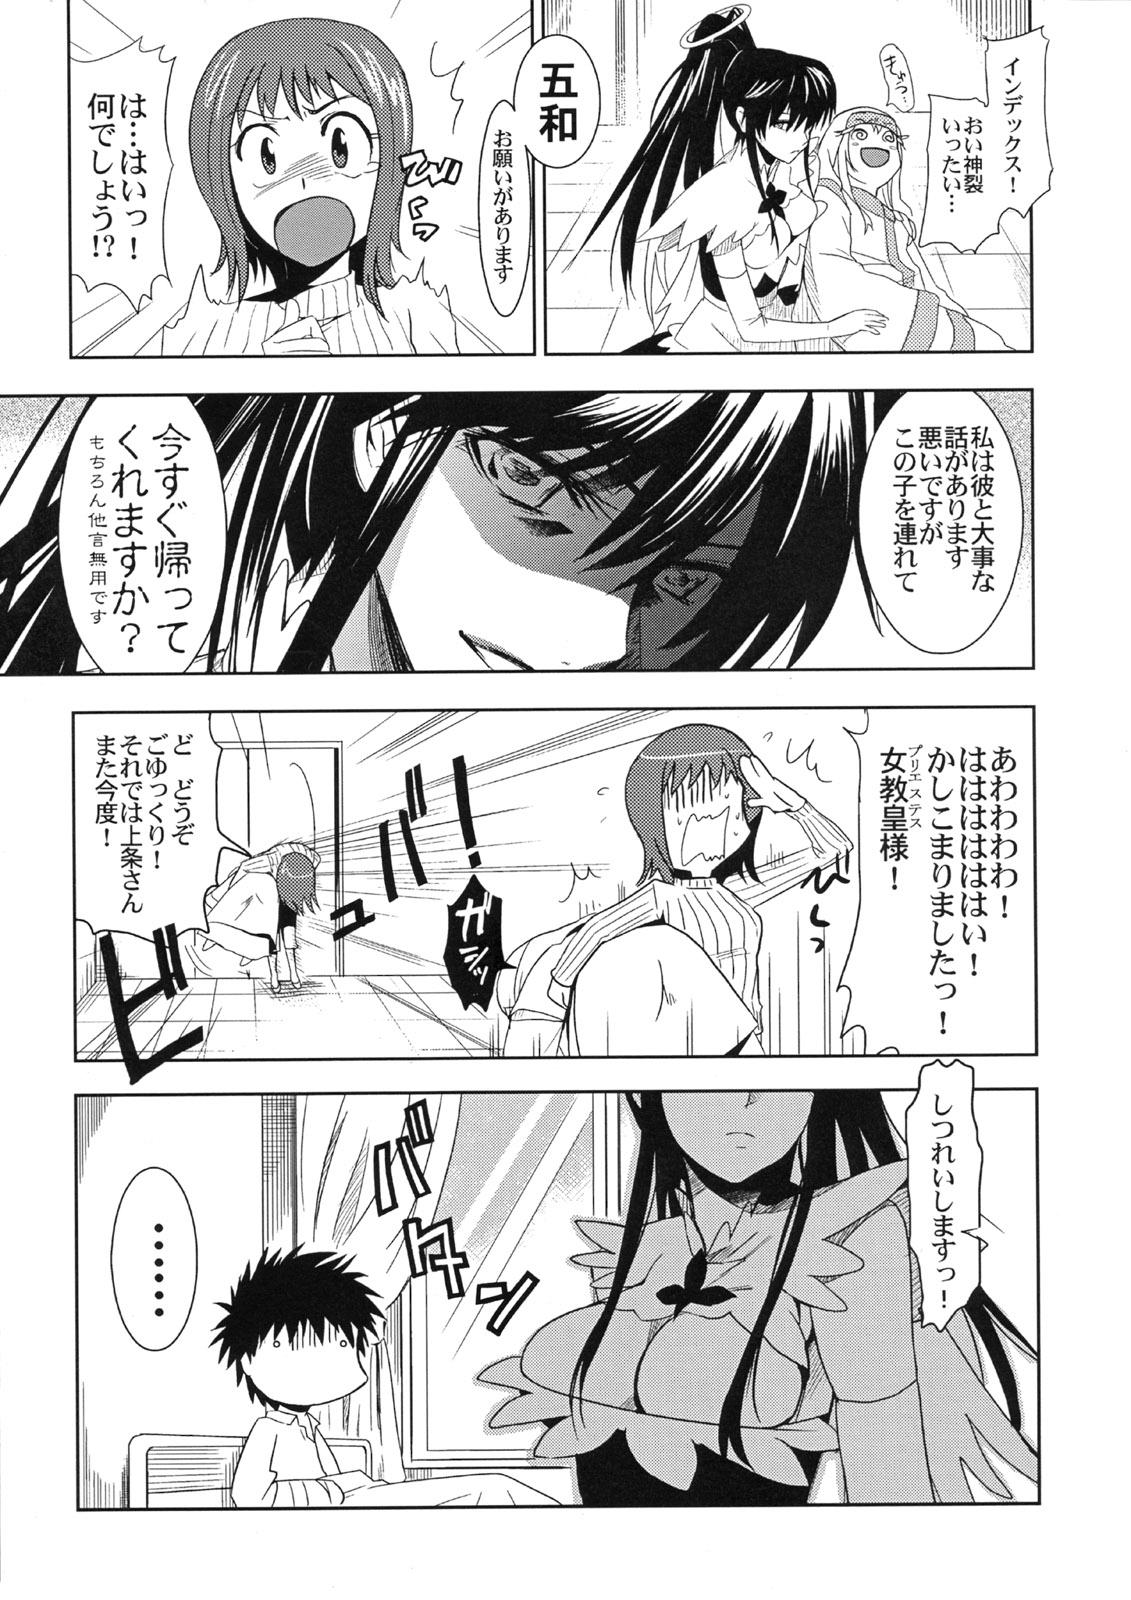 to majutsu rokudenashi records koushi akashic Diane 7 deadly sins nude